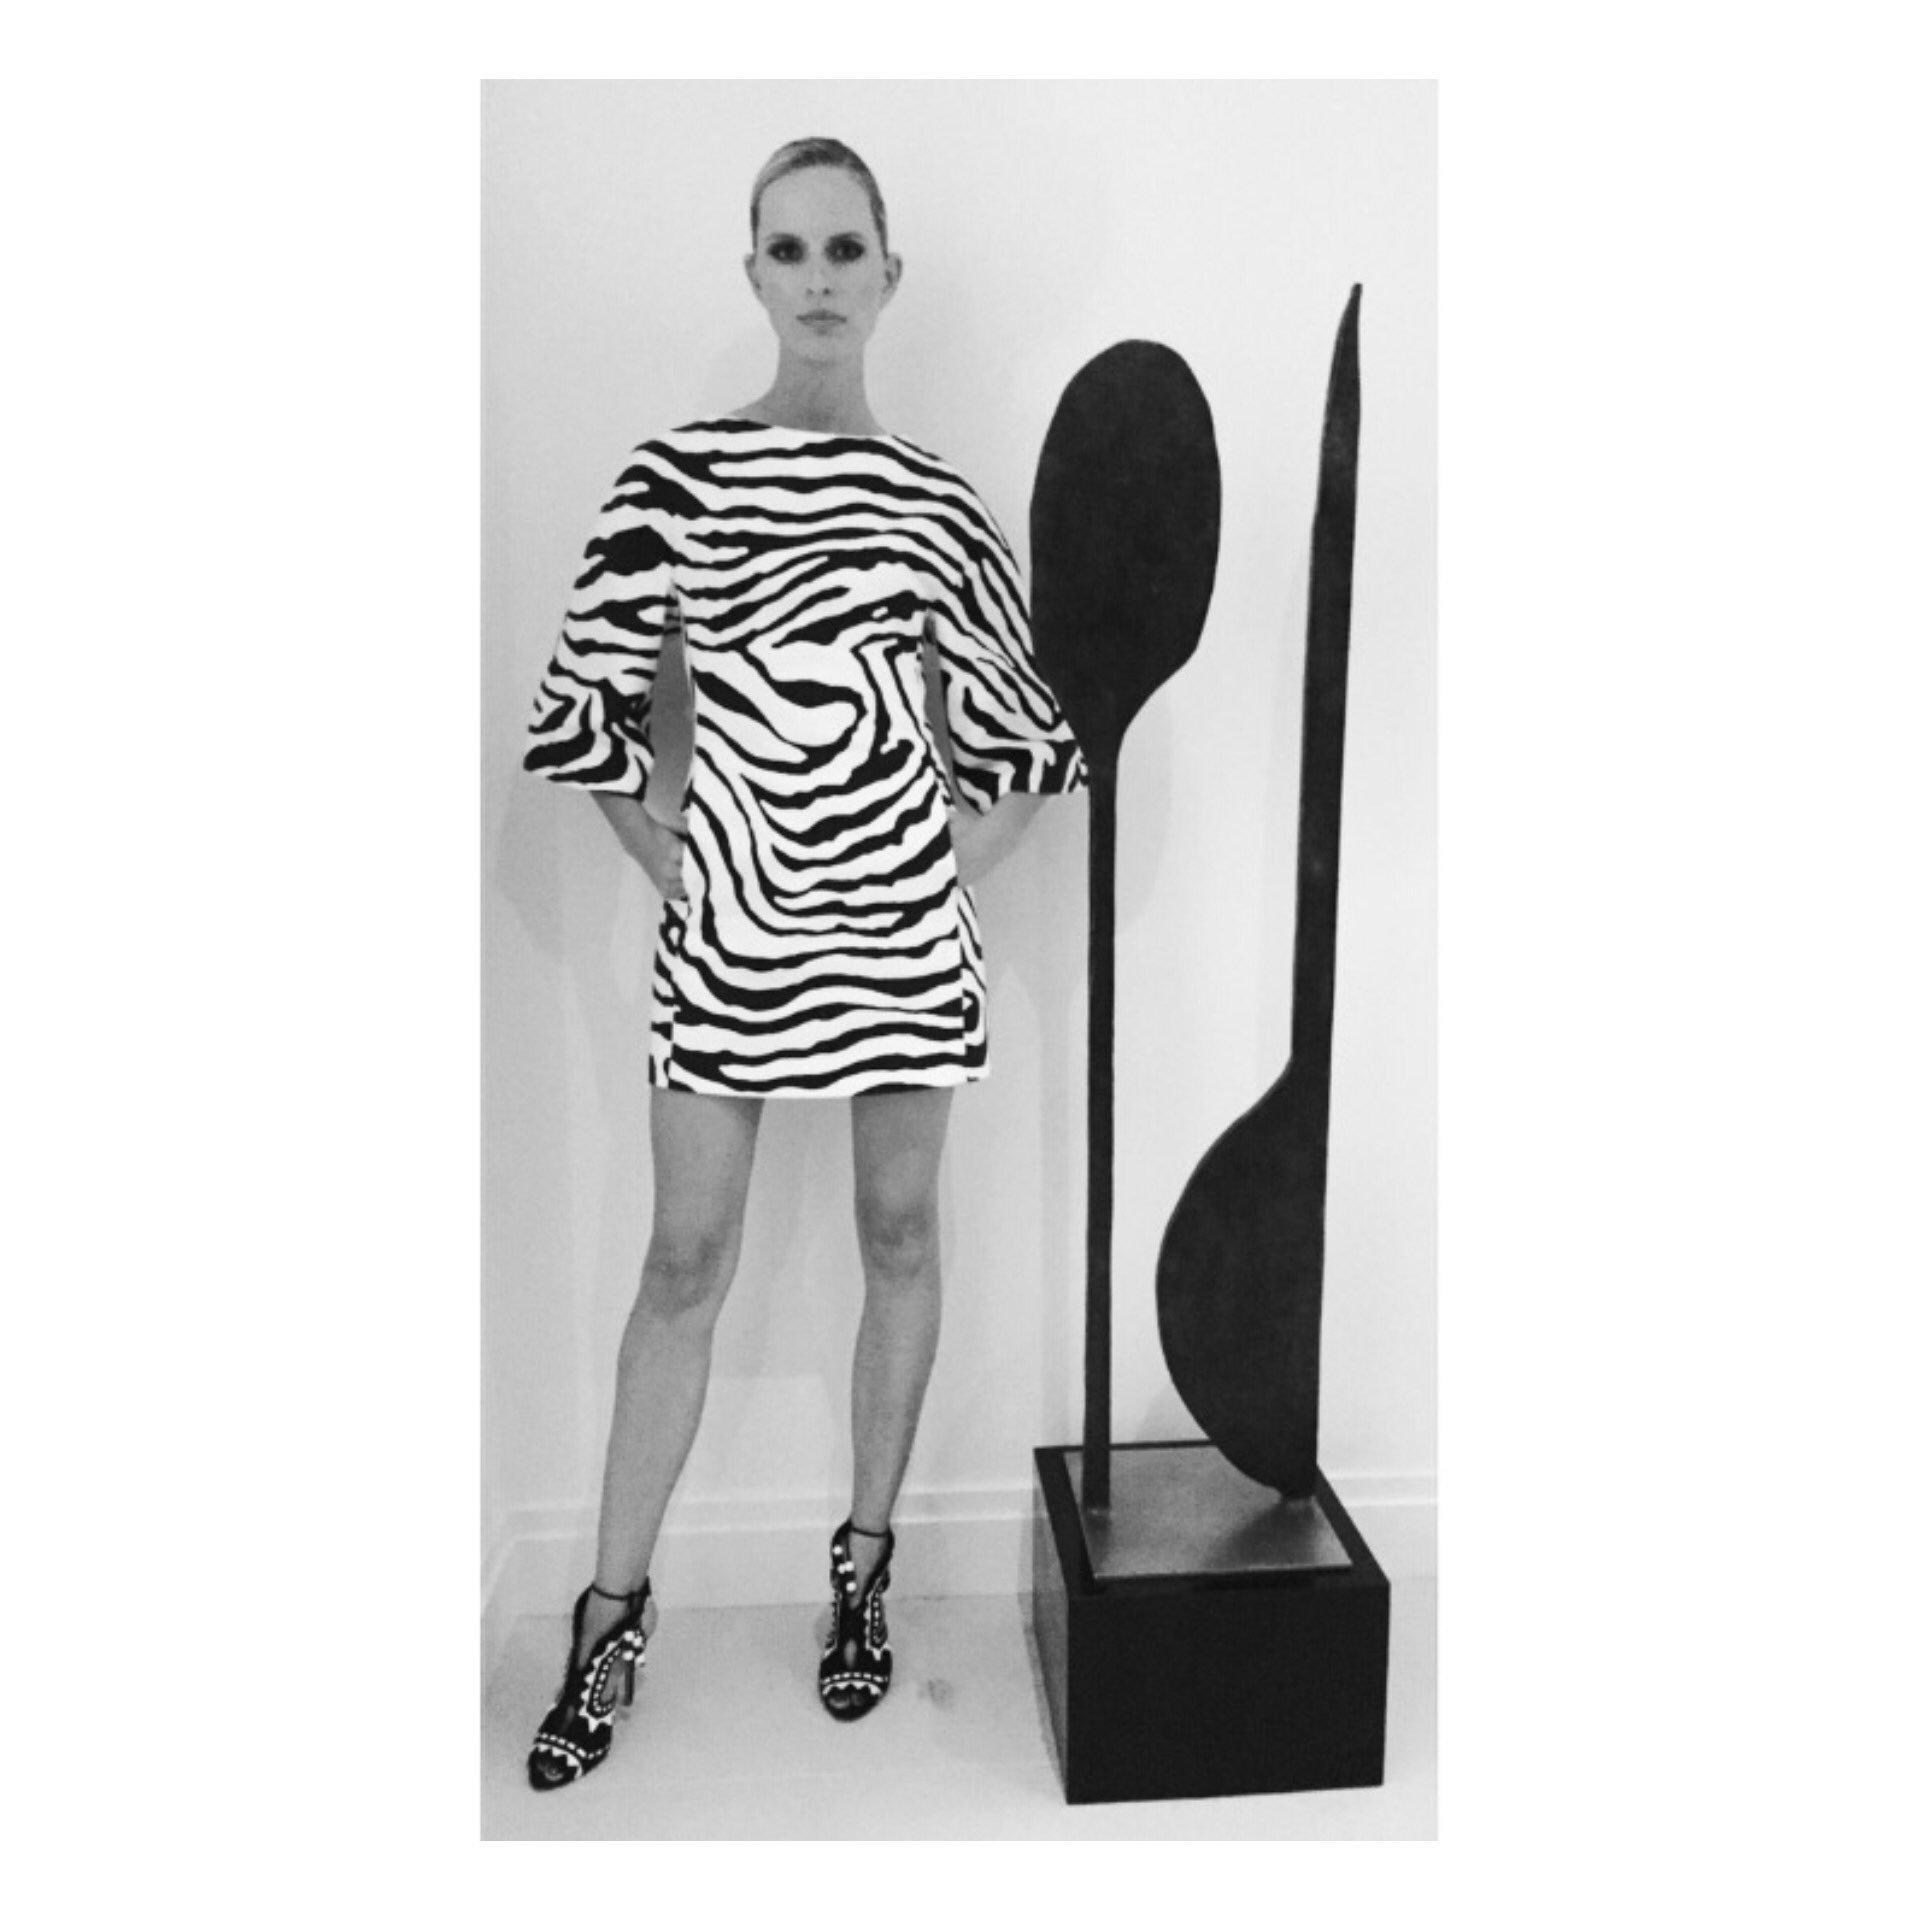 It's a Zebra Print kind of Night #ArtBaselMiami #ArtBasel #Art #BlackandWhite #Miami #Fashion #KKstyle #Style https://t.co/s4iRranYDh